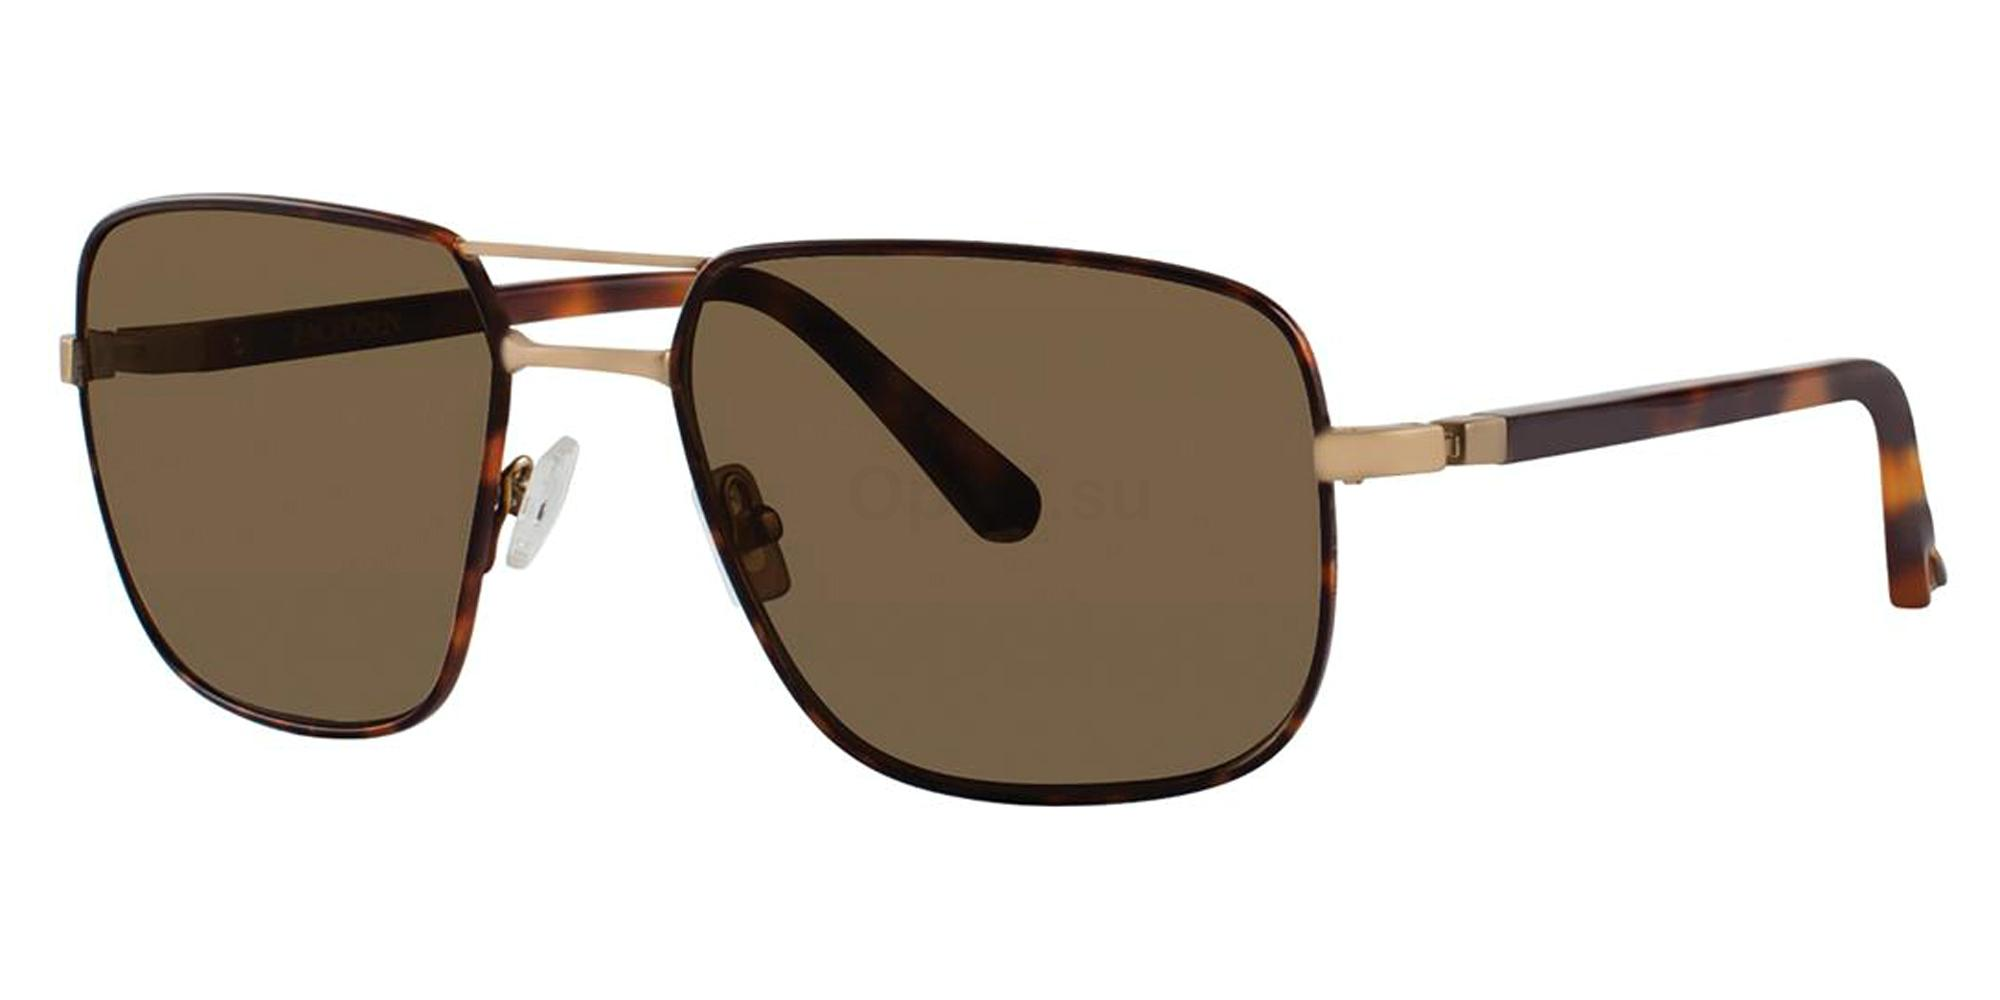 Blonde Tortoise CLEMENT Sunglasses, Zac Posen